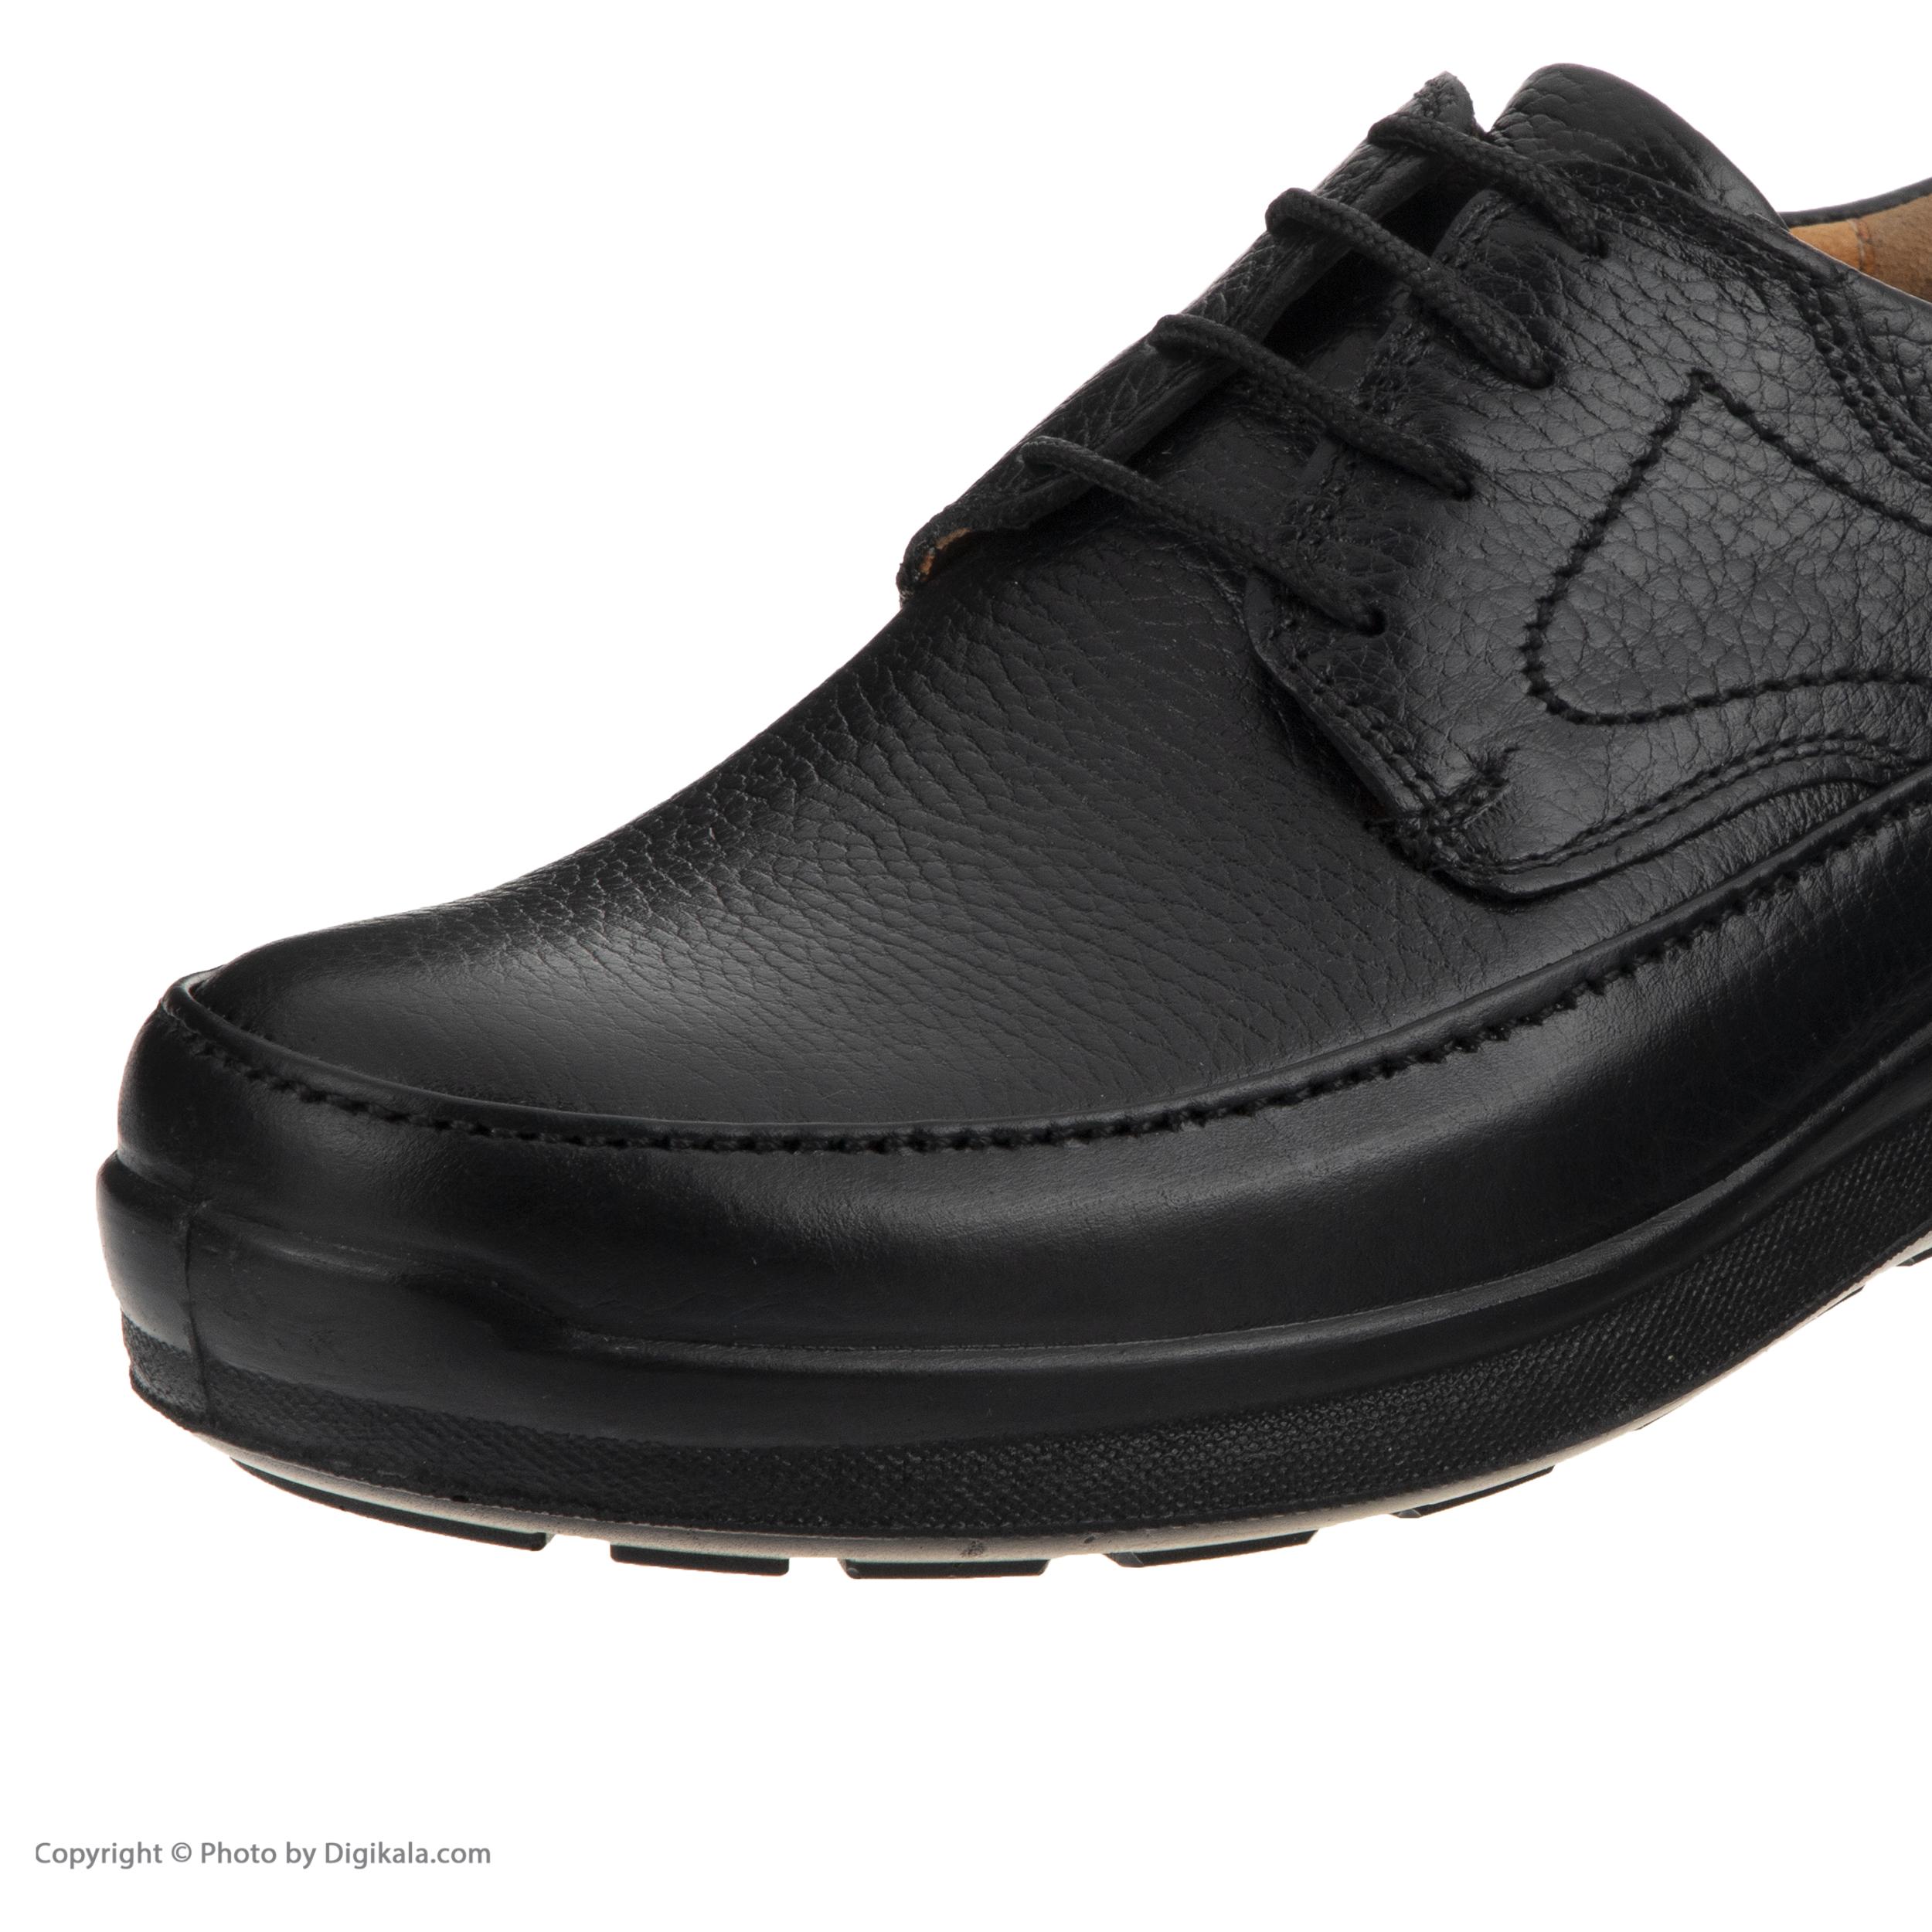 کفش روزمره مردانه بلوط مدل 7266C503101 -  - 8